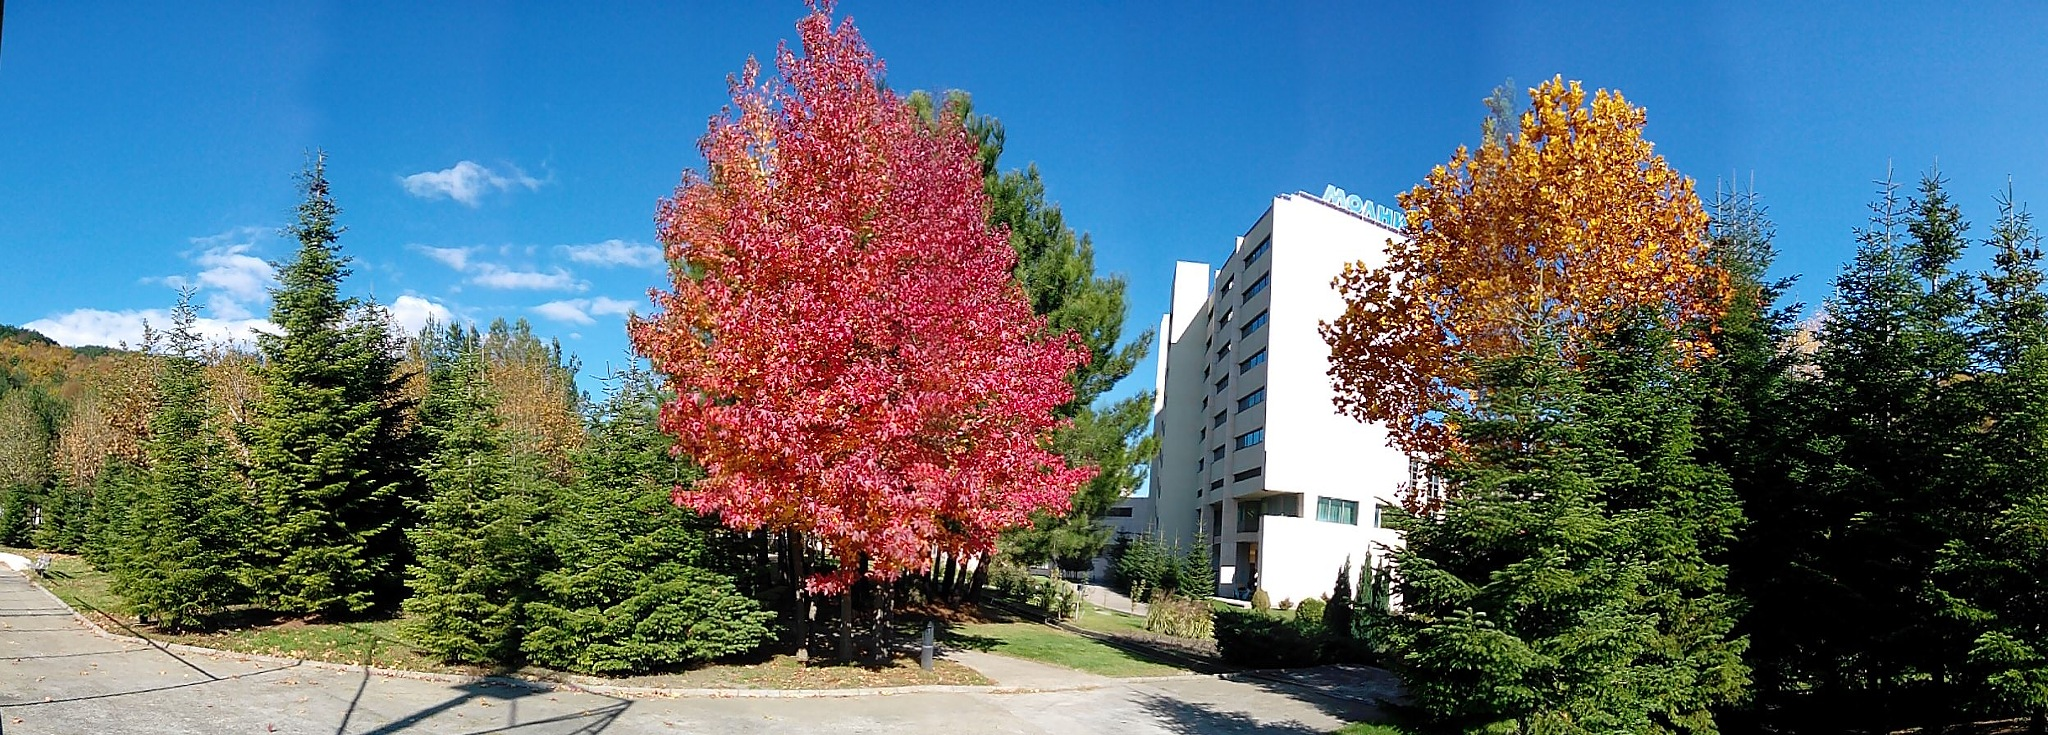 Fall colors by Roman Prikhodko